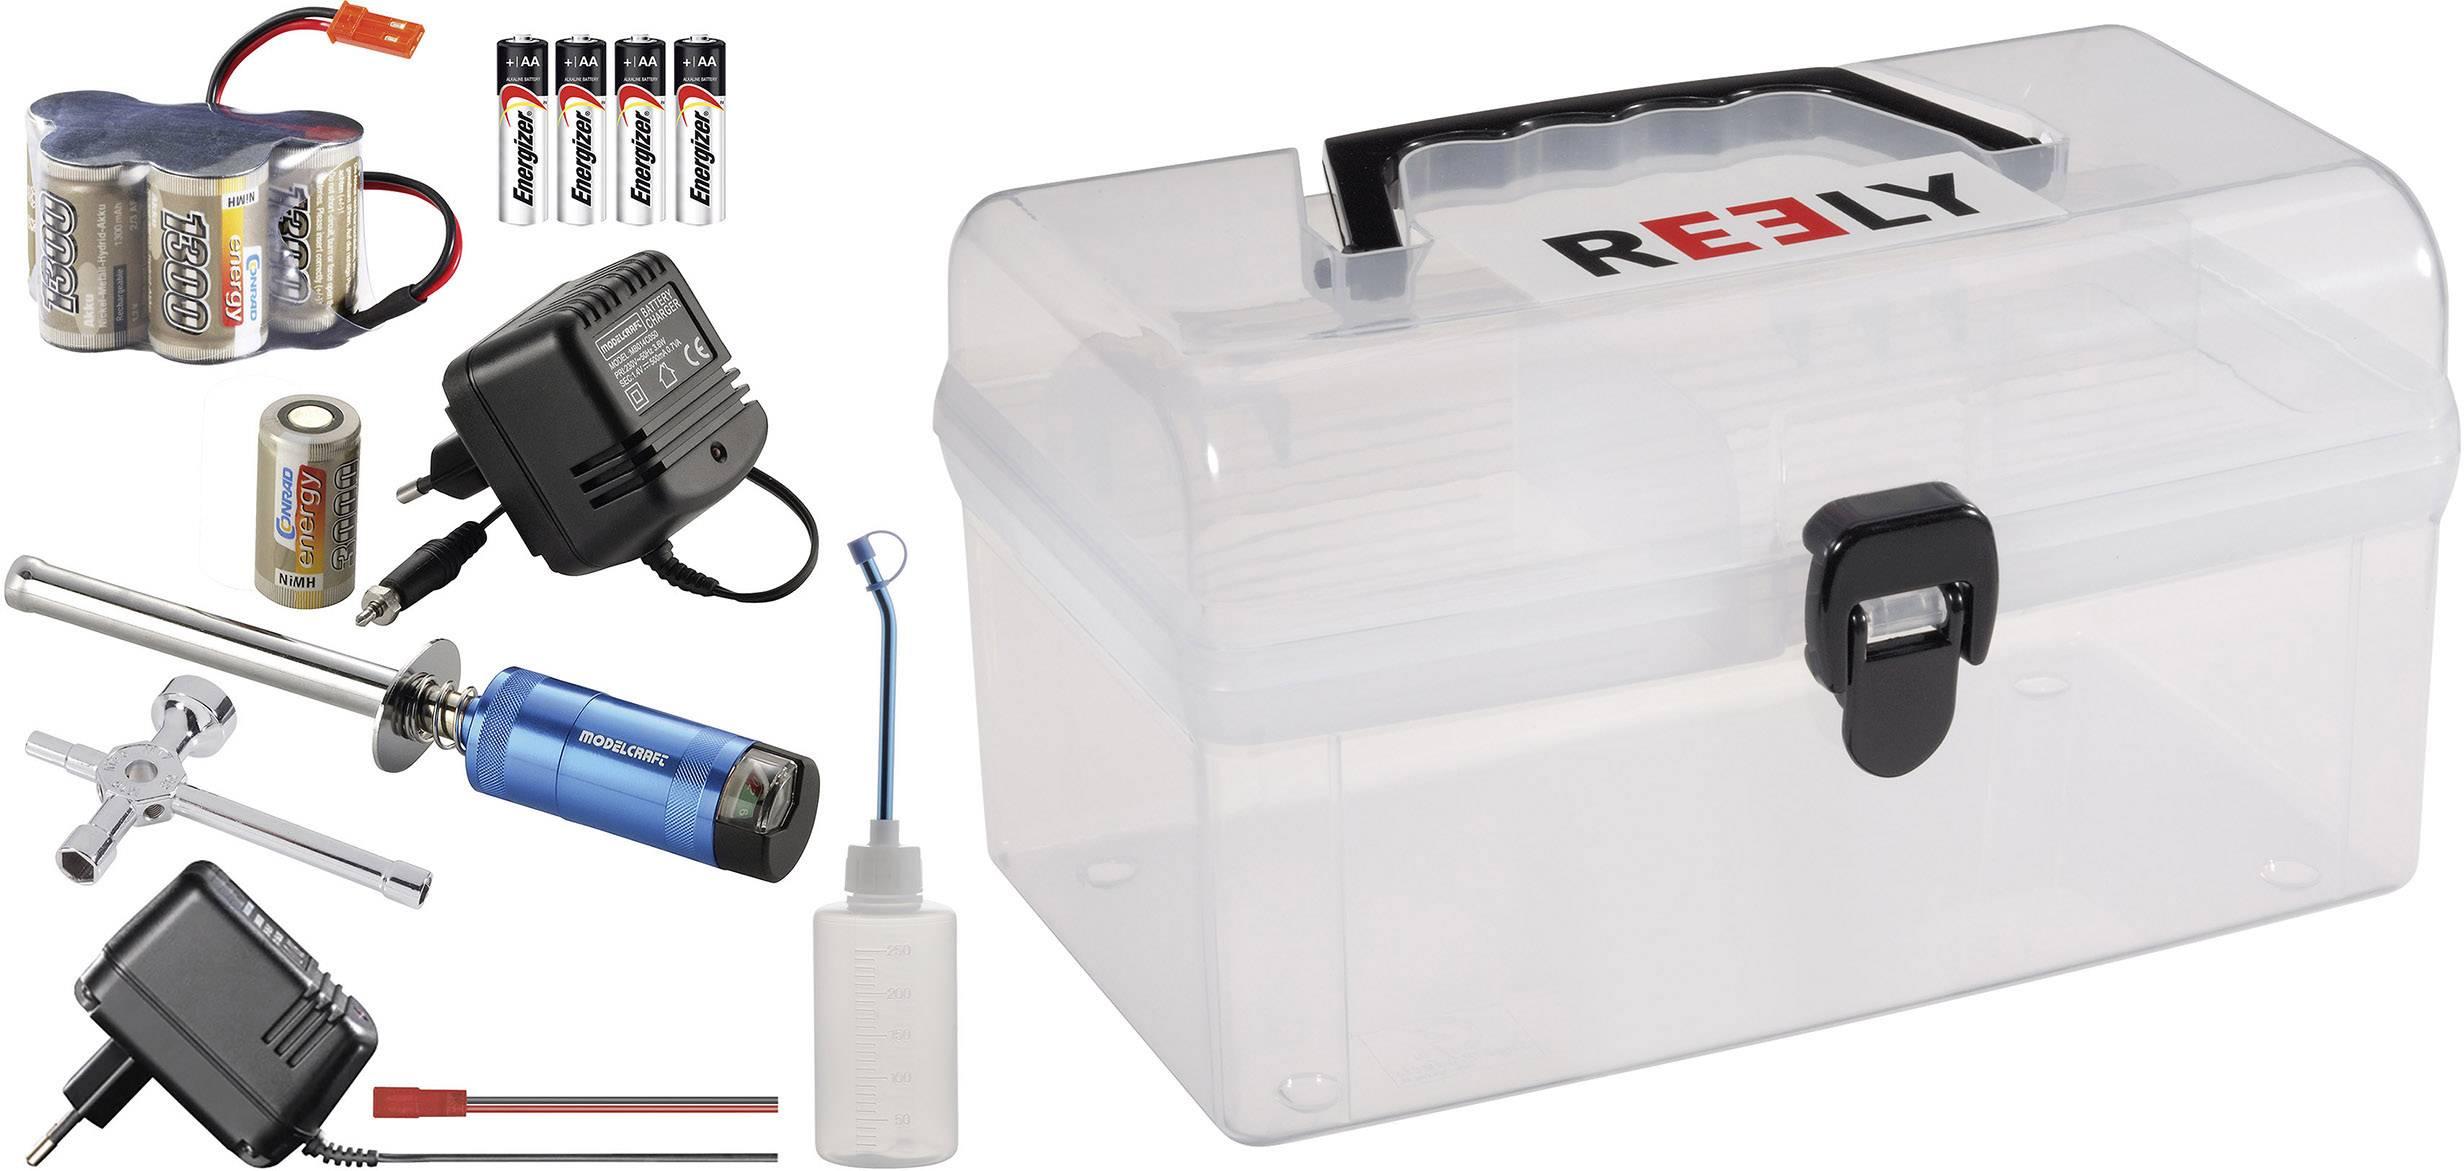 Kompletná sada pro modely aut s nitro motorom Reely Nitro box 1:8 (RTR)